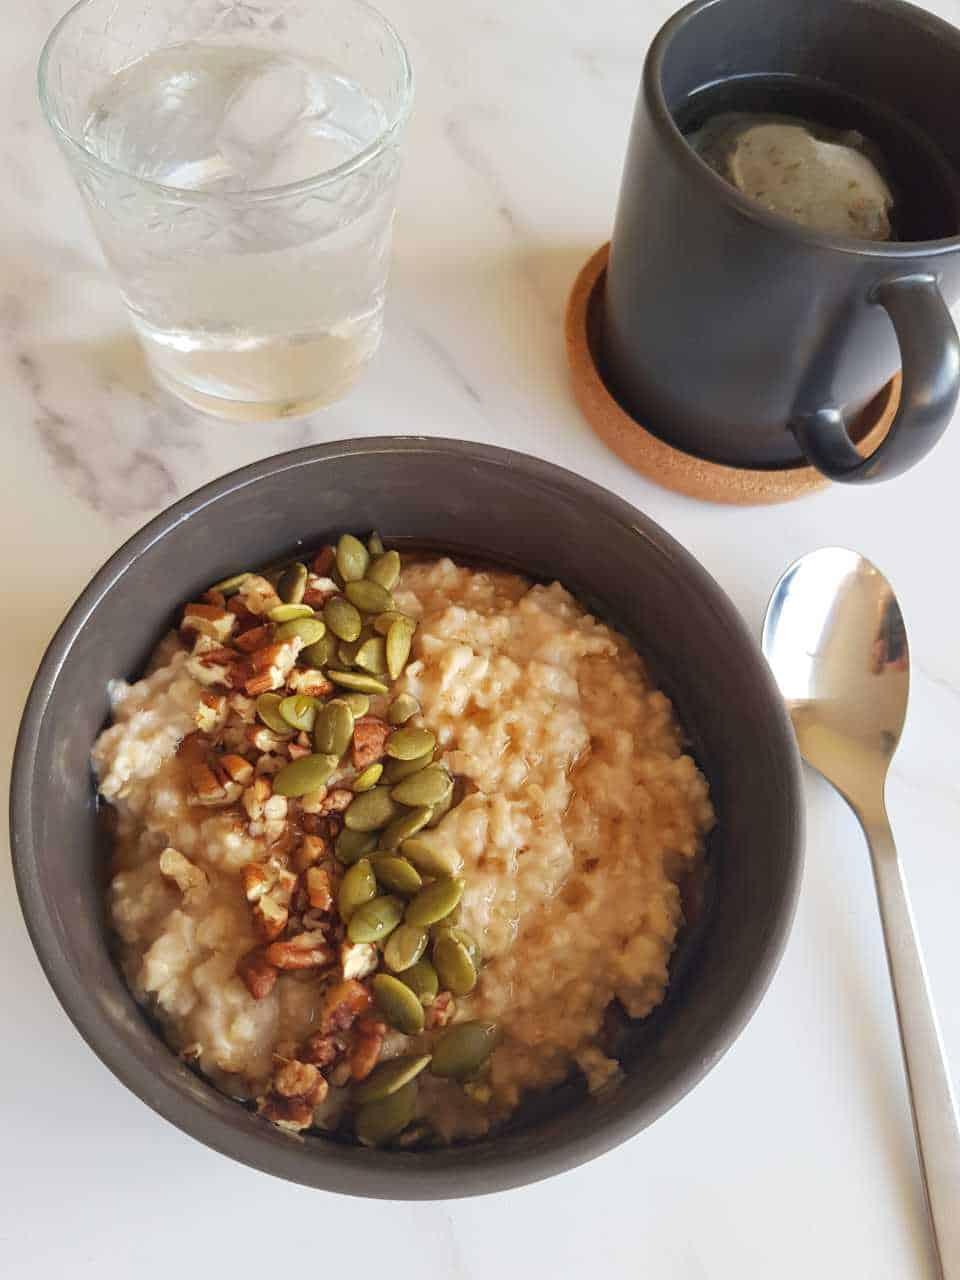 Maple oatmeal